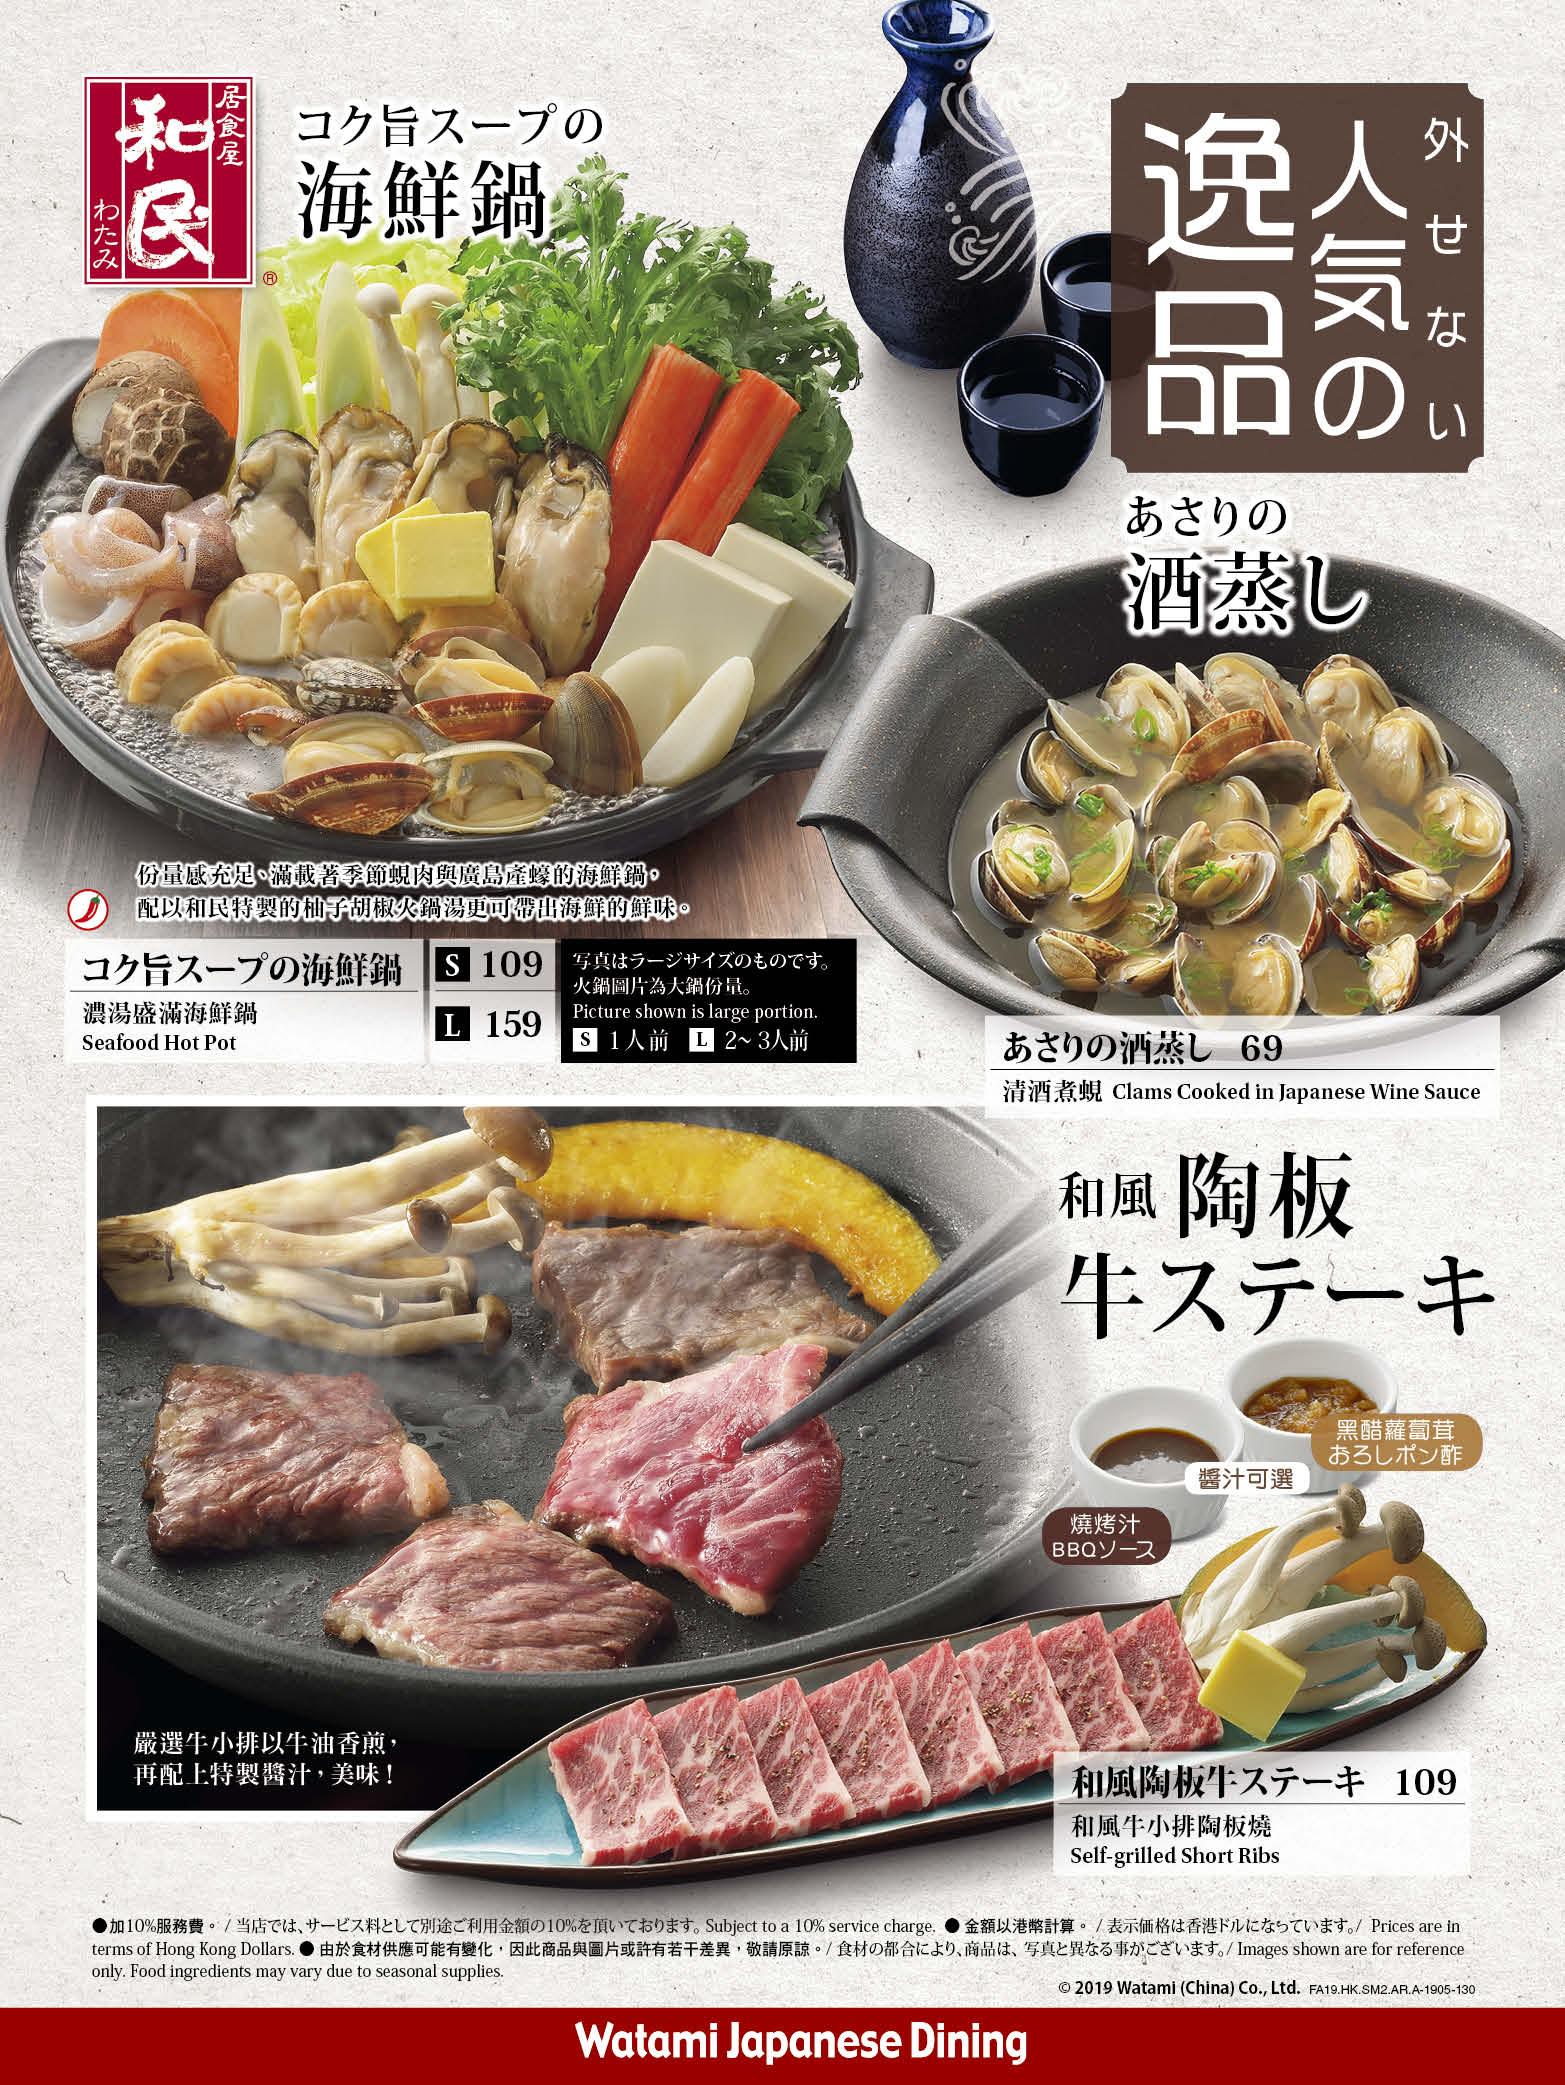 19.HK.SM2.m.A(3)2.jpg